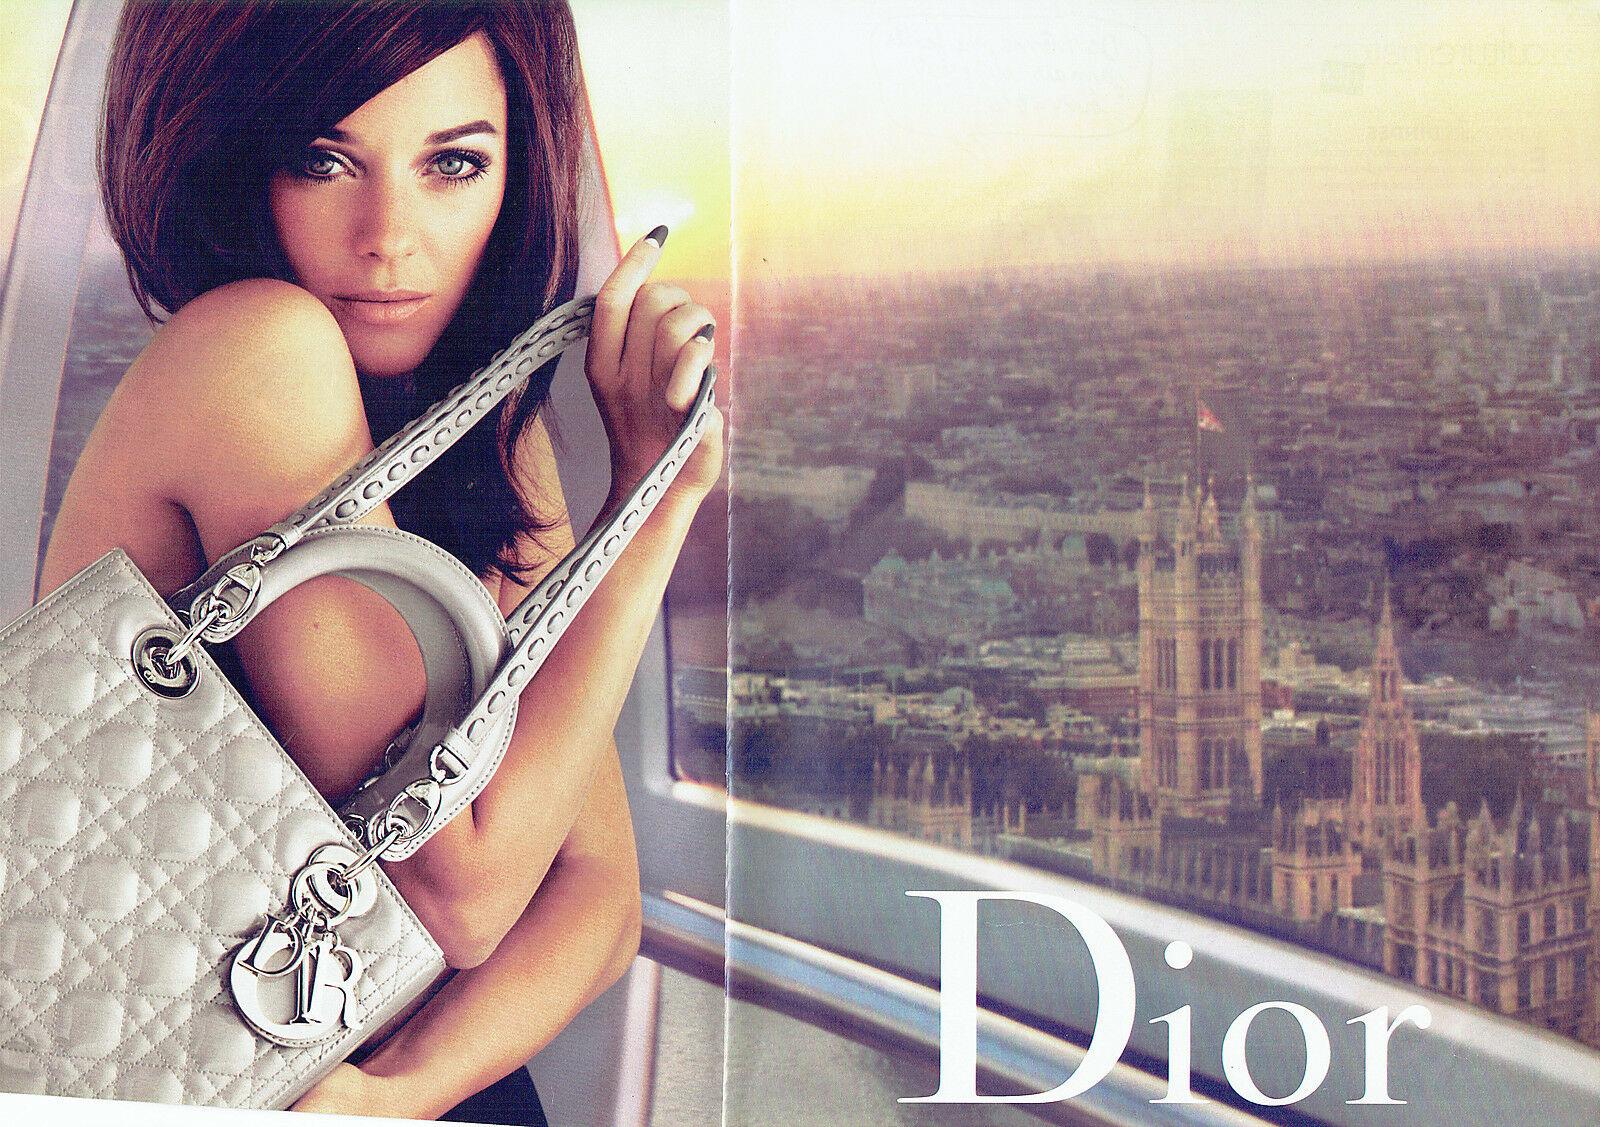 Dior D 2010 Marion Cotillard Mert Alas et Marcus Piggott Londres Grande Roue gros plan